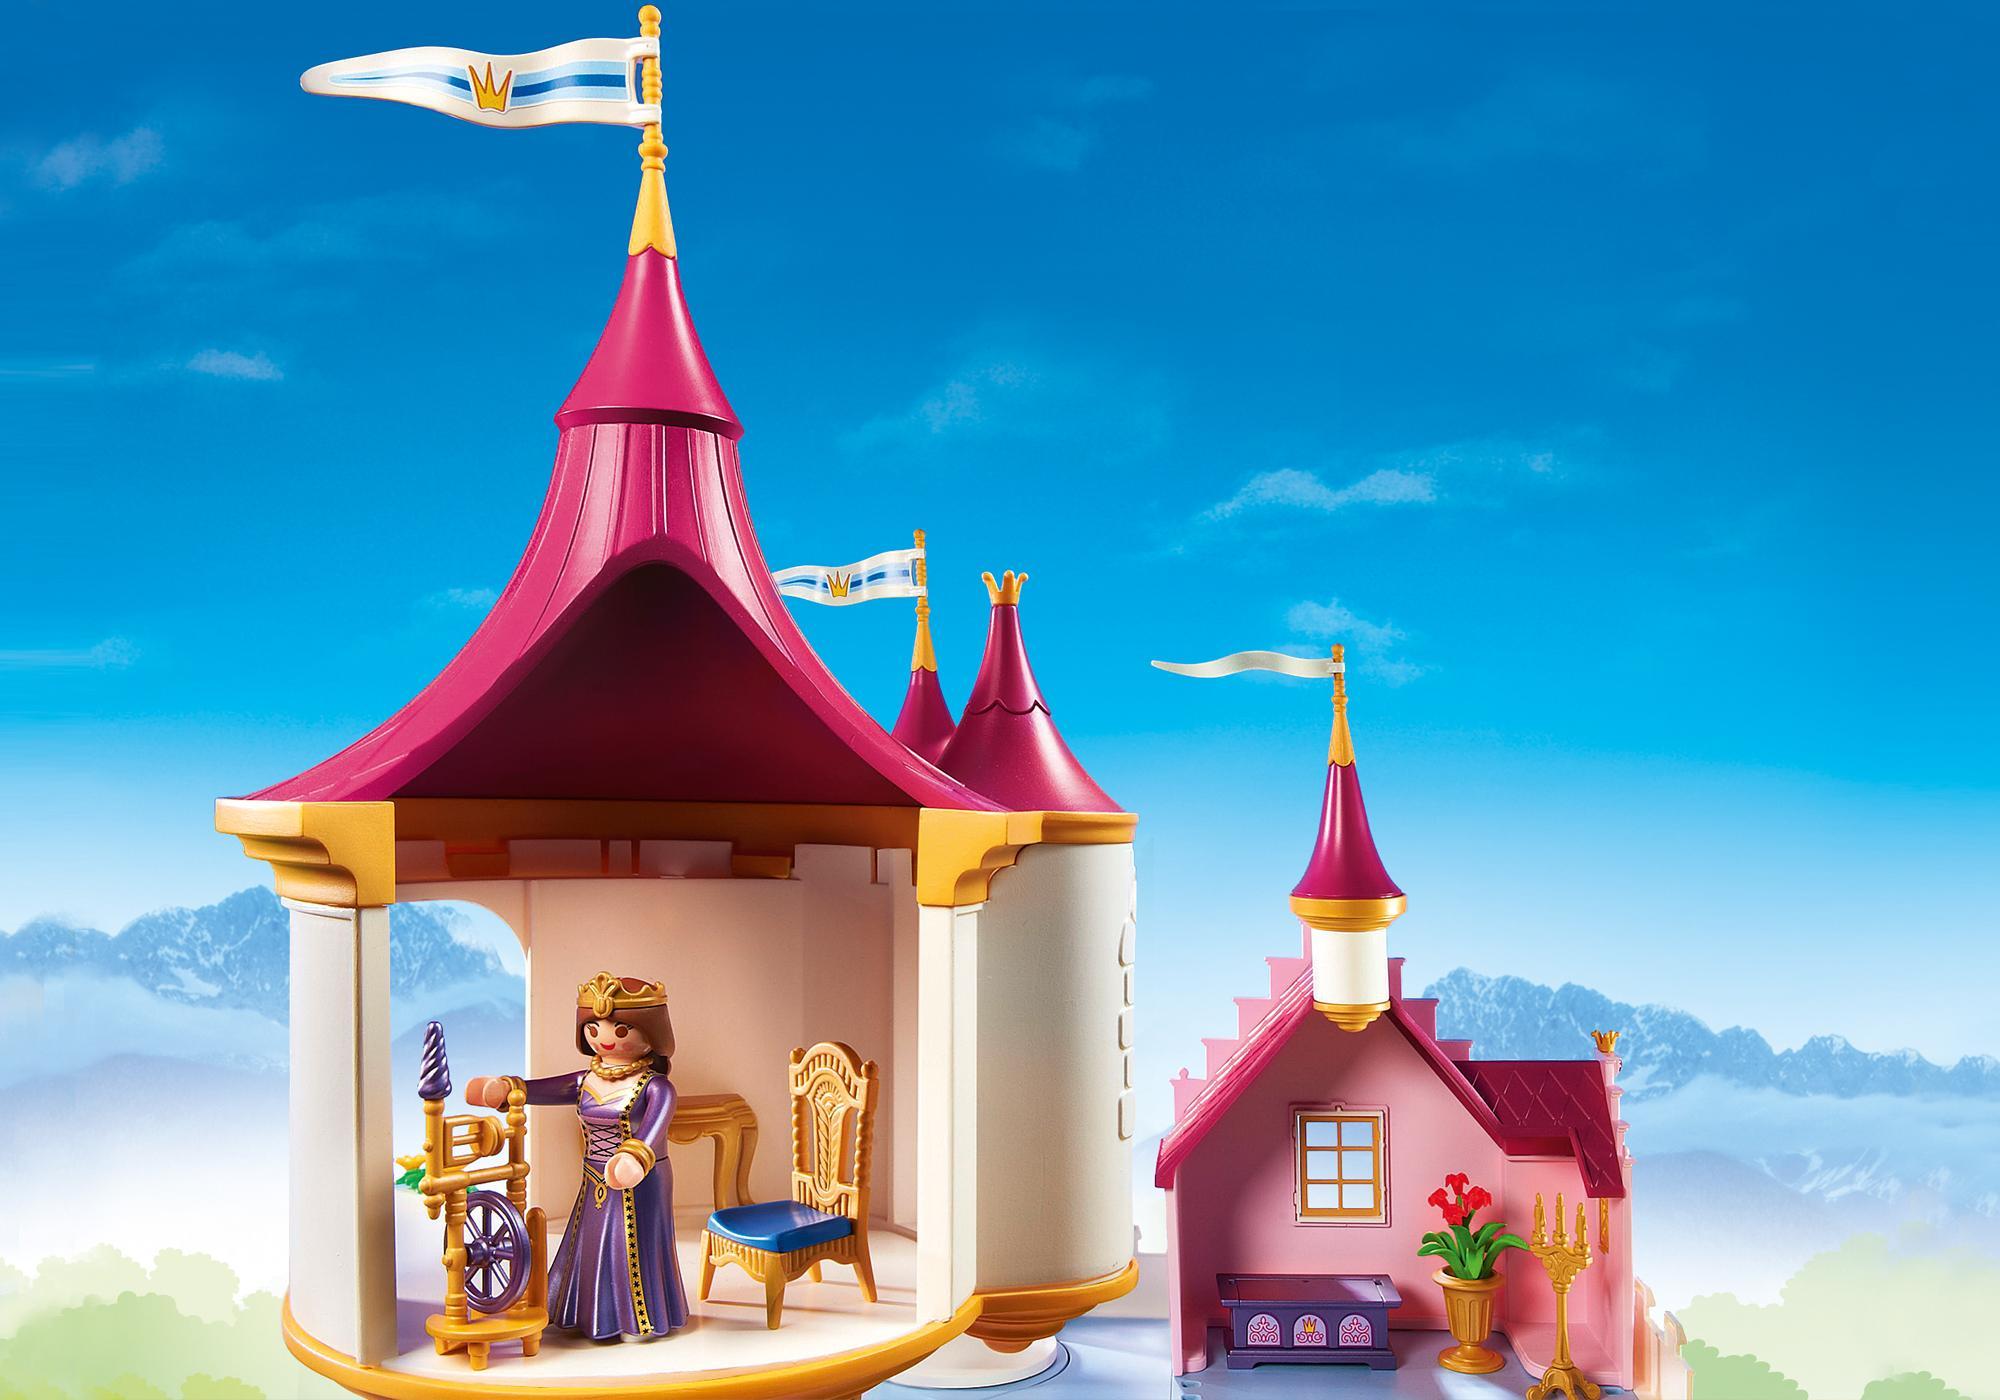 http://media.playmobil.com/i/playmobil/6848_product_extra2/Замок Принцессы: Большой Замок Принцессы